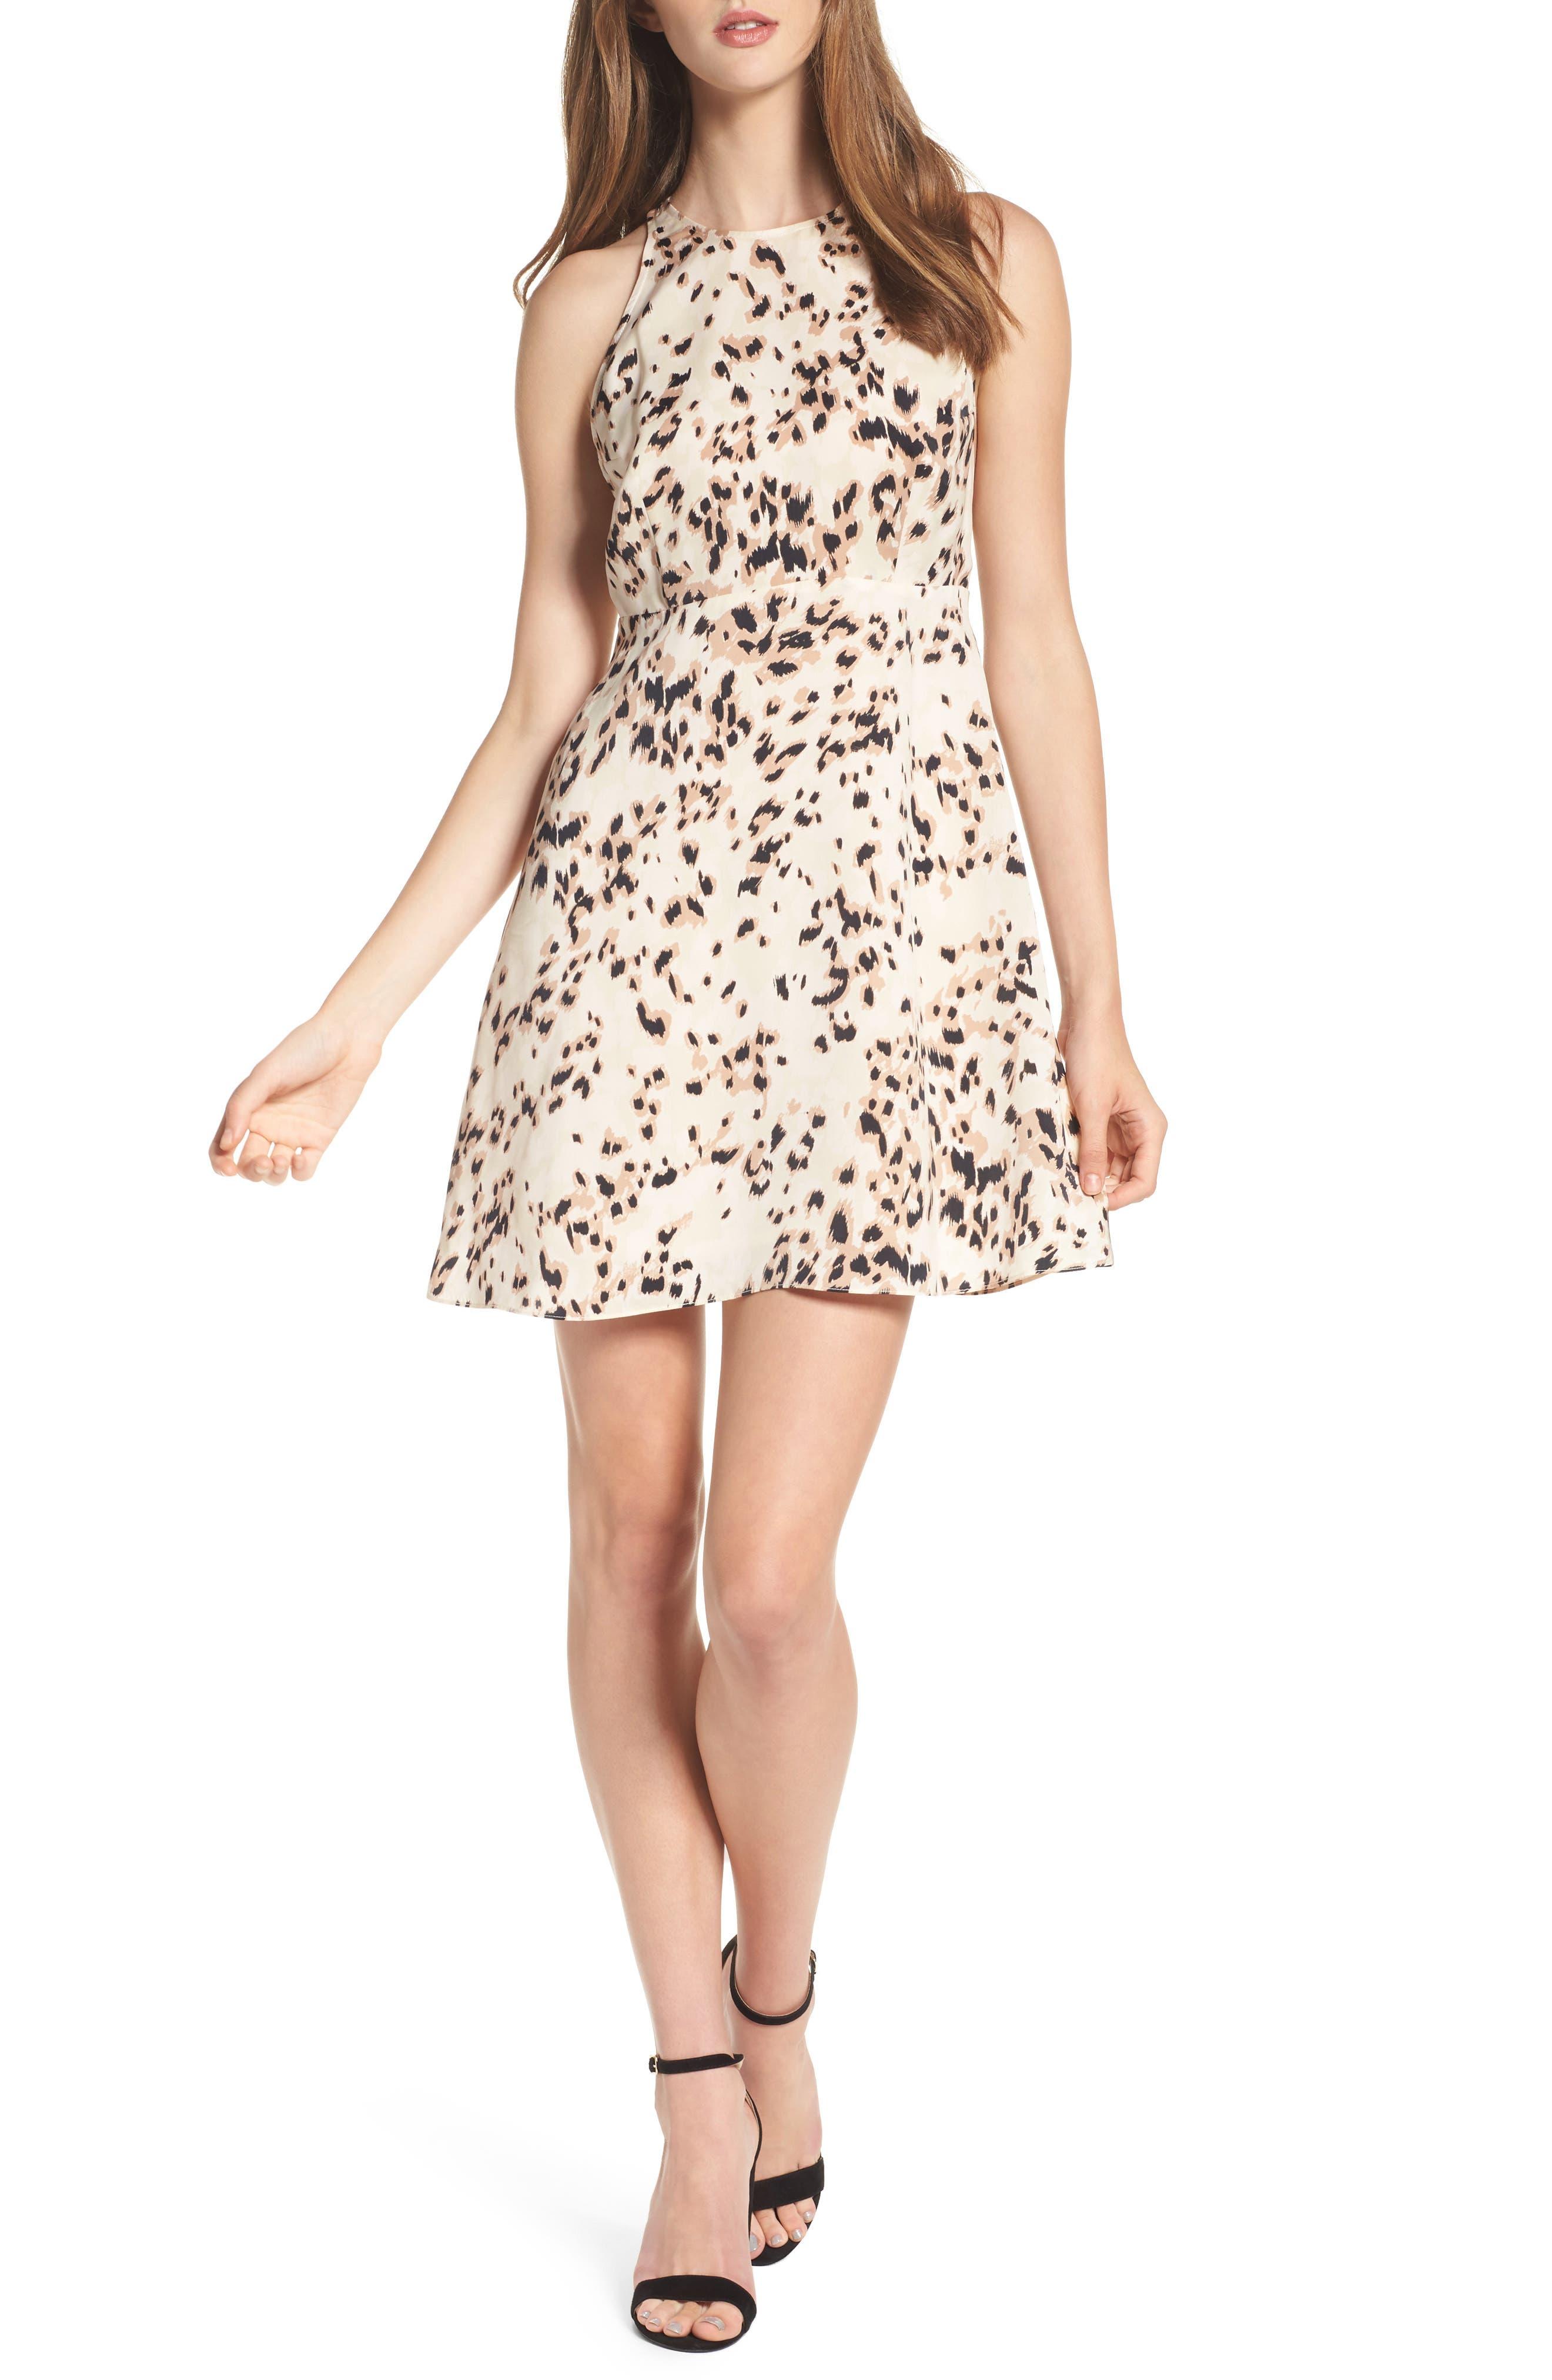 Ingrid Swing Dress,                         Main,                         color, Nude Skins